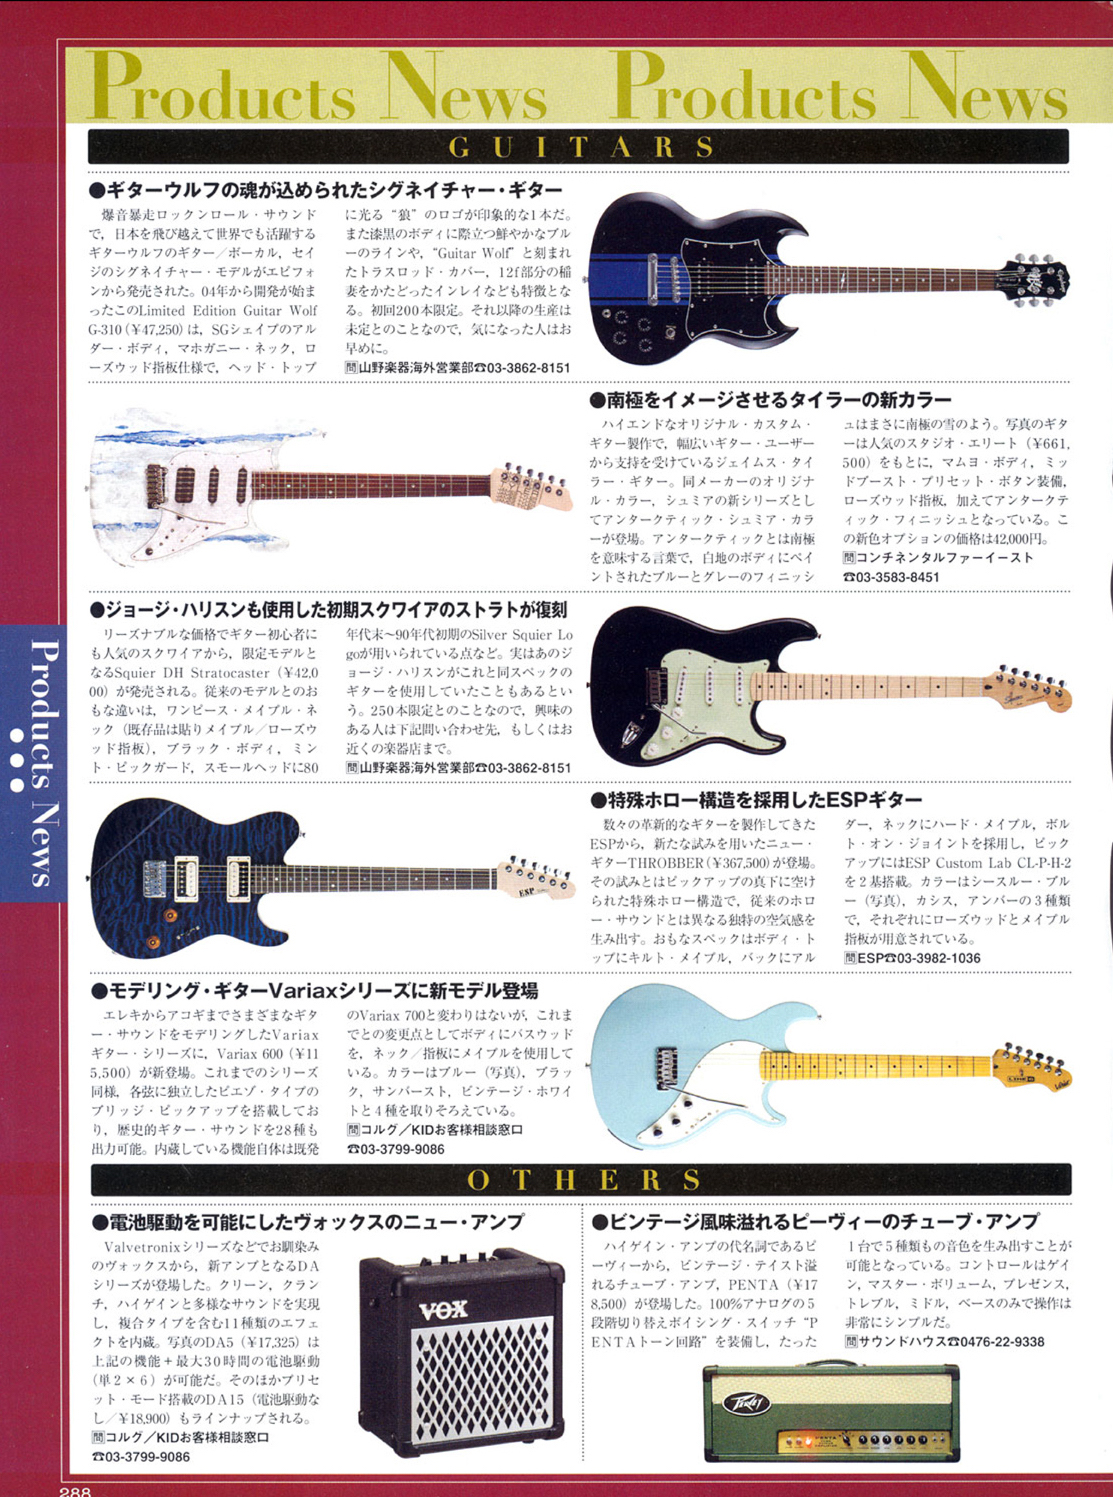 Copy of 2006 Guitar Magazine - Jan.